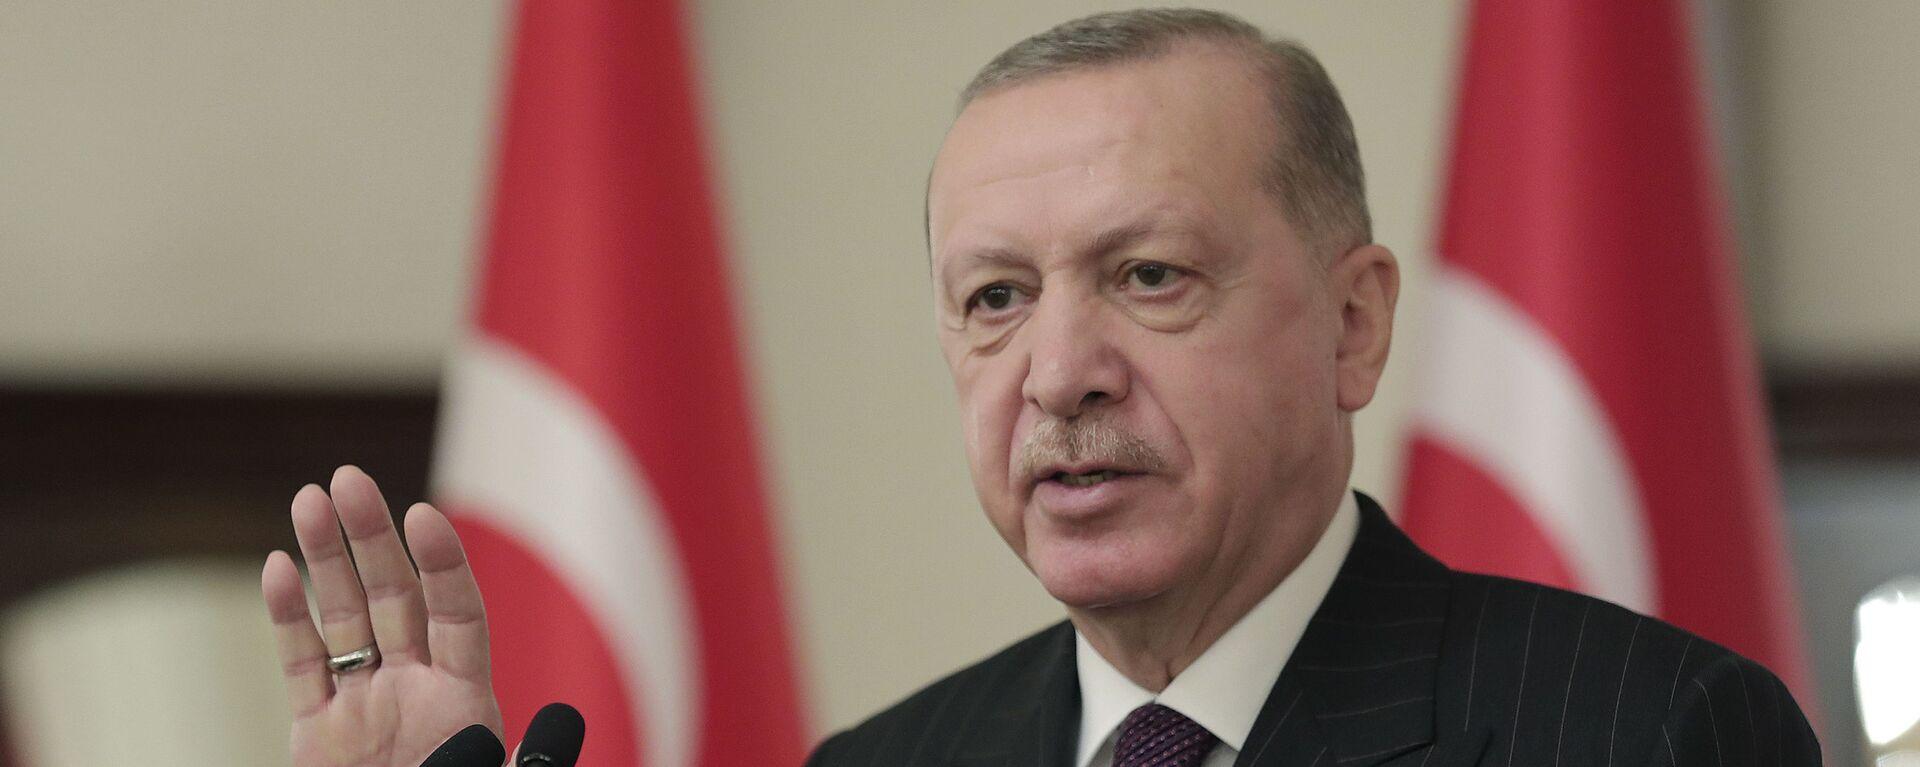 Predsednik Turske Redžep Tajip Erdogan - Sputnik Srbija, 1920, 23.08.2021